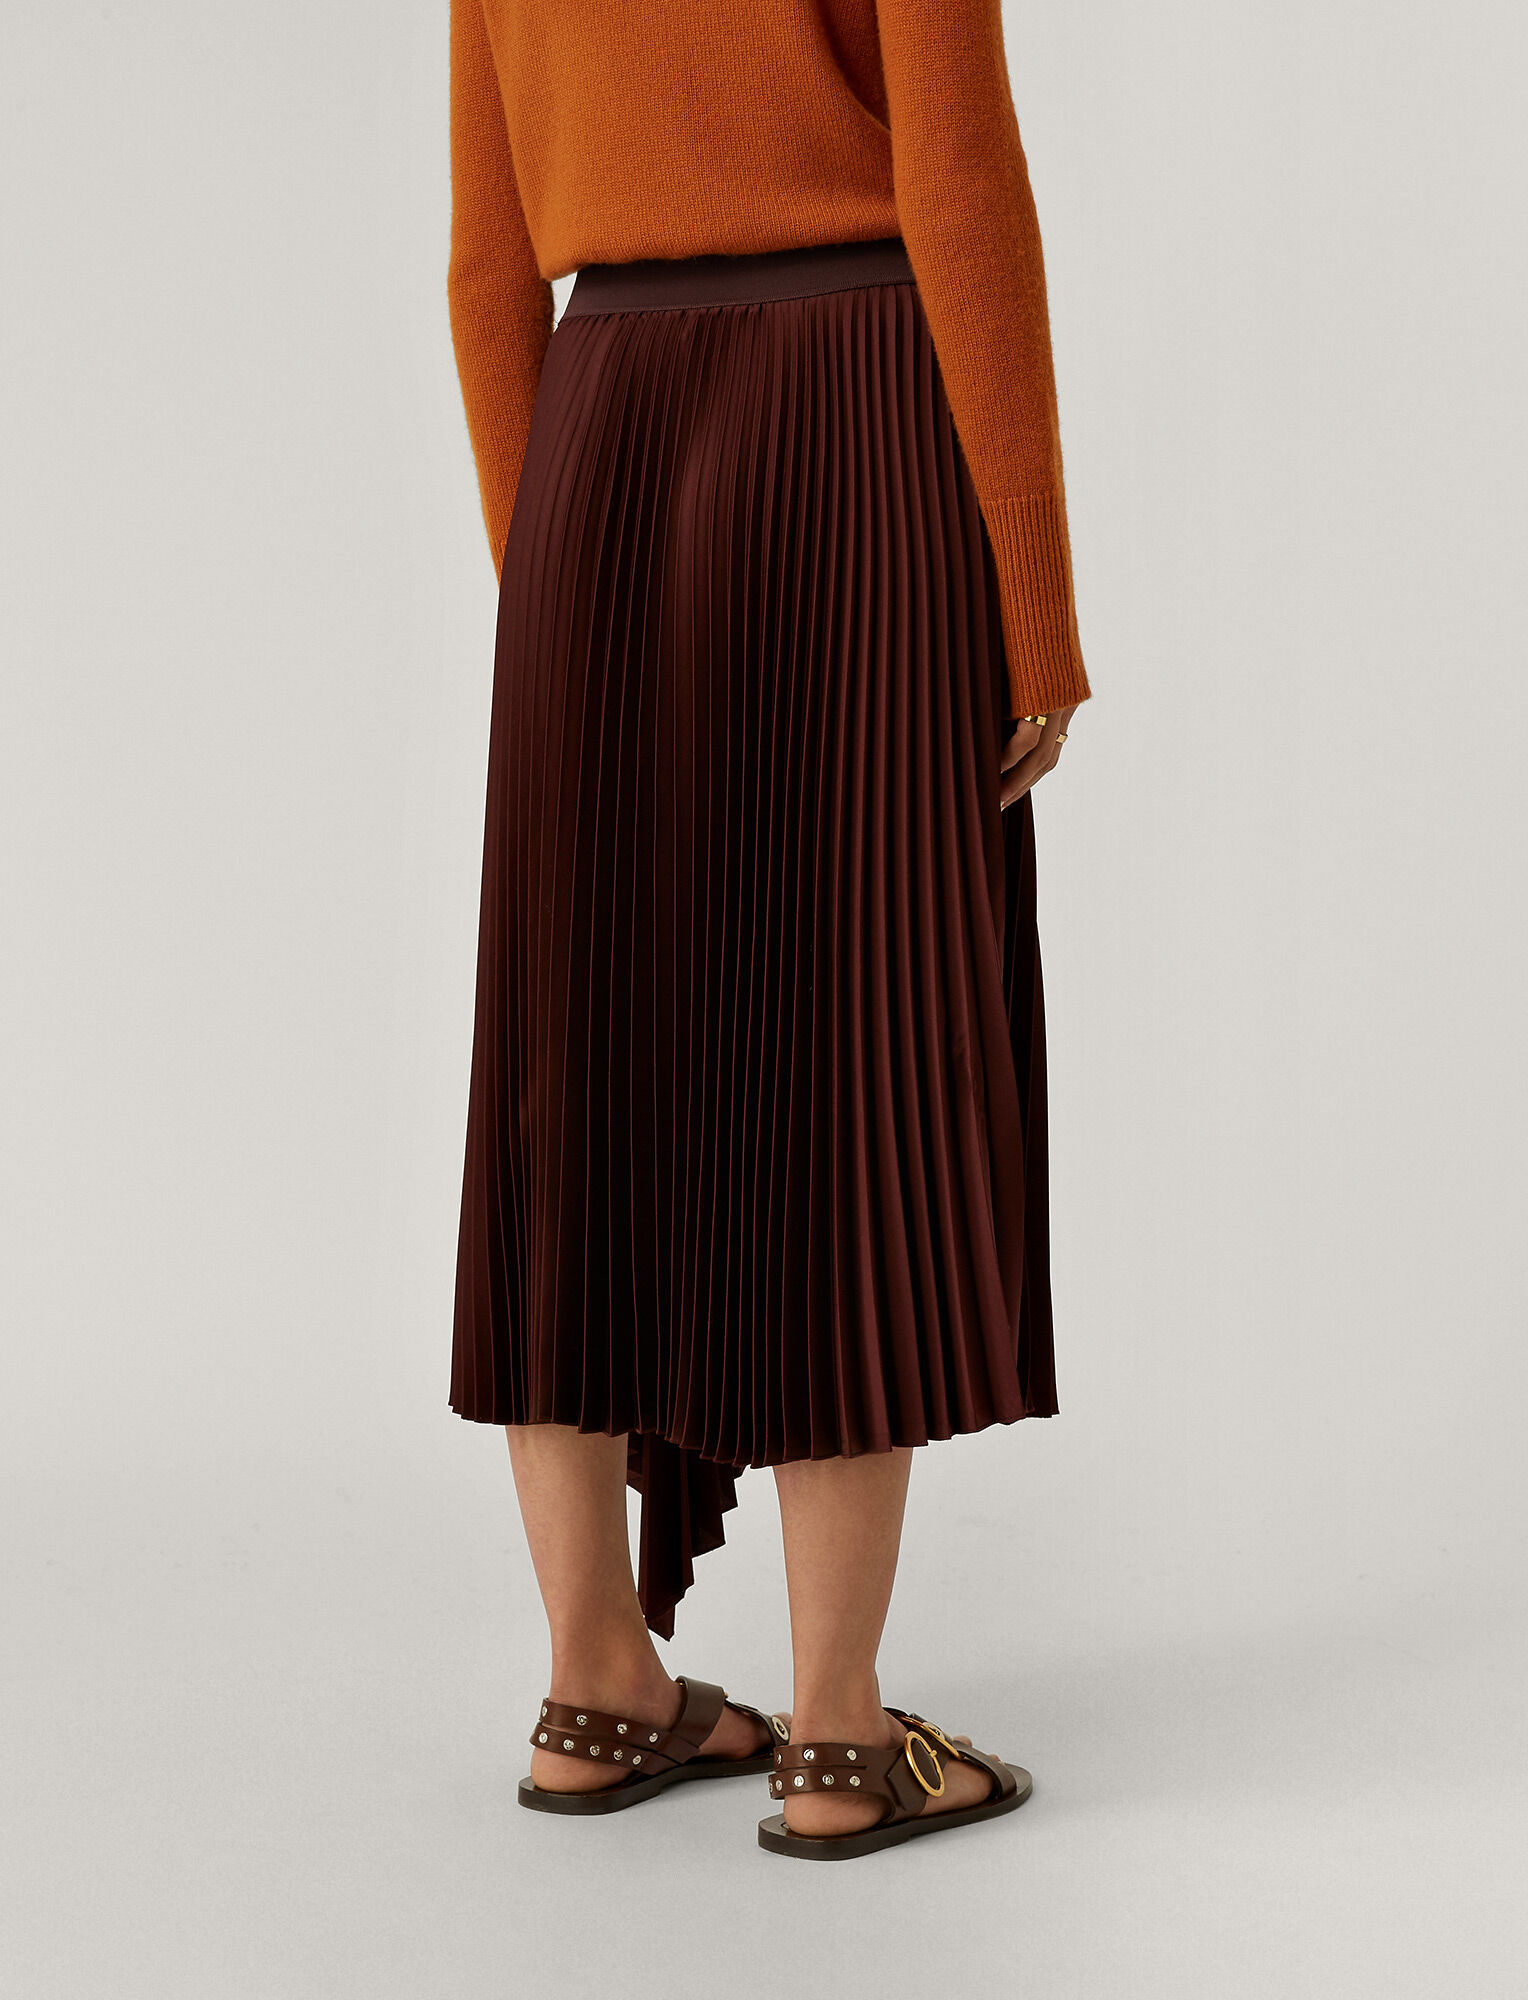 Joseph, Sabin Knit Weave Plissé Skirt, in Ganache